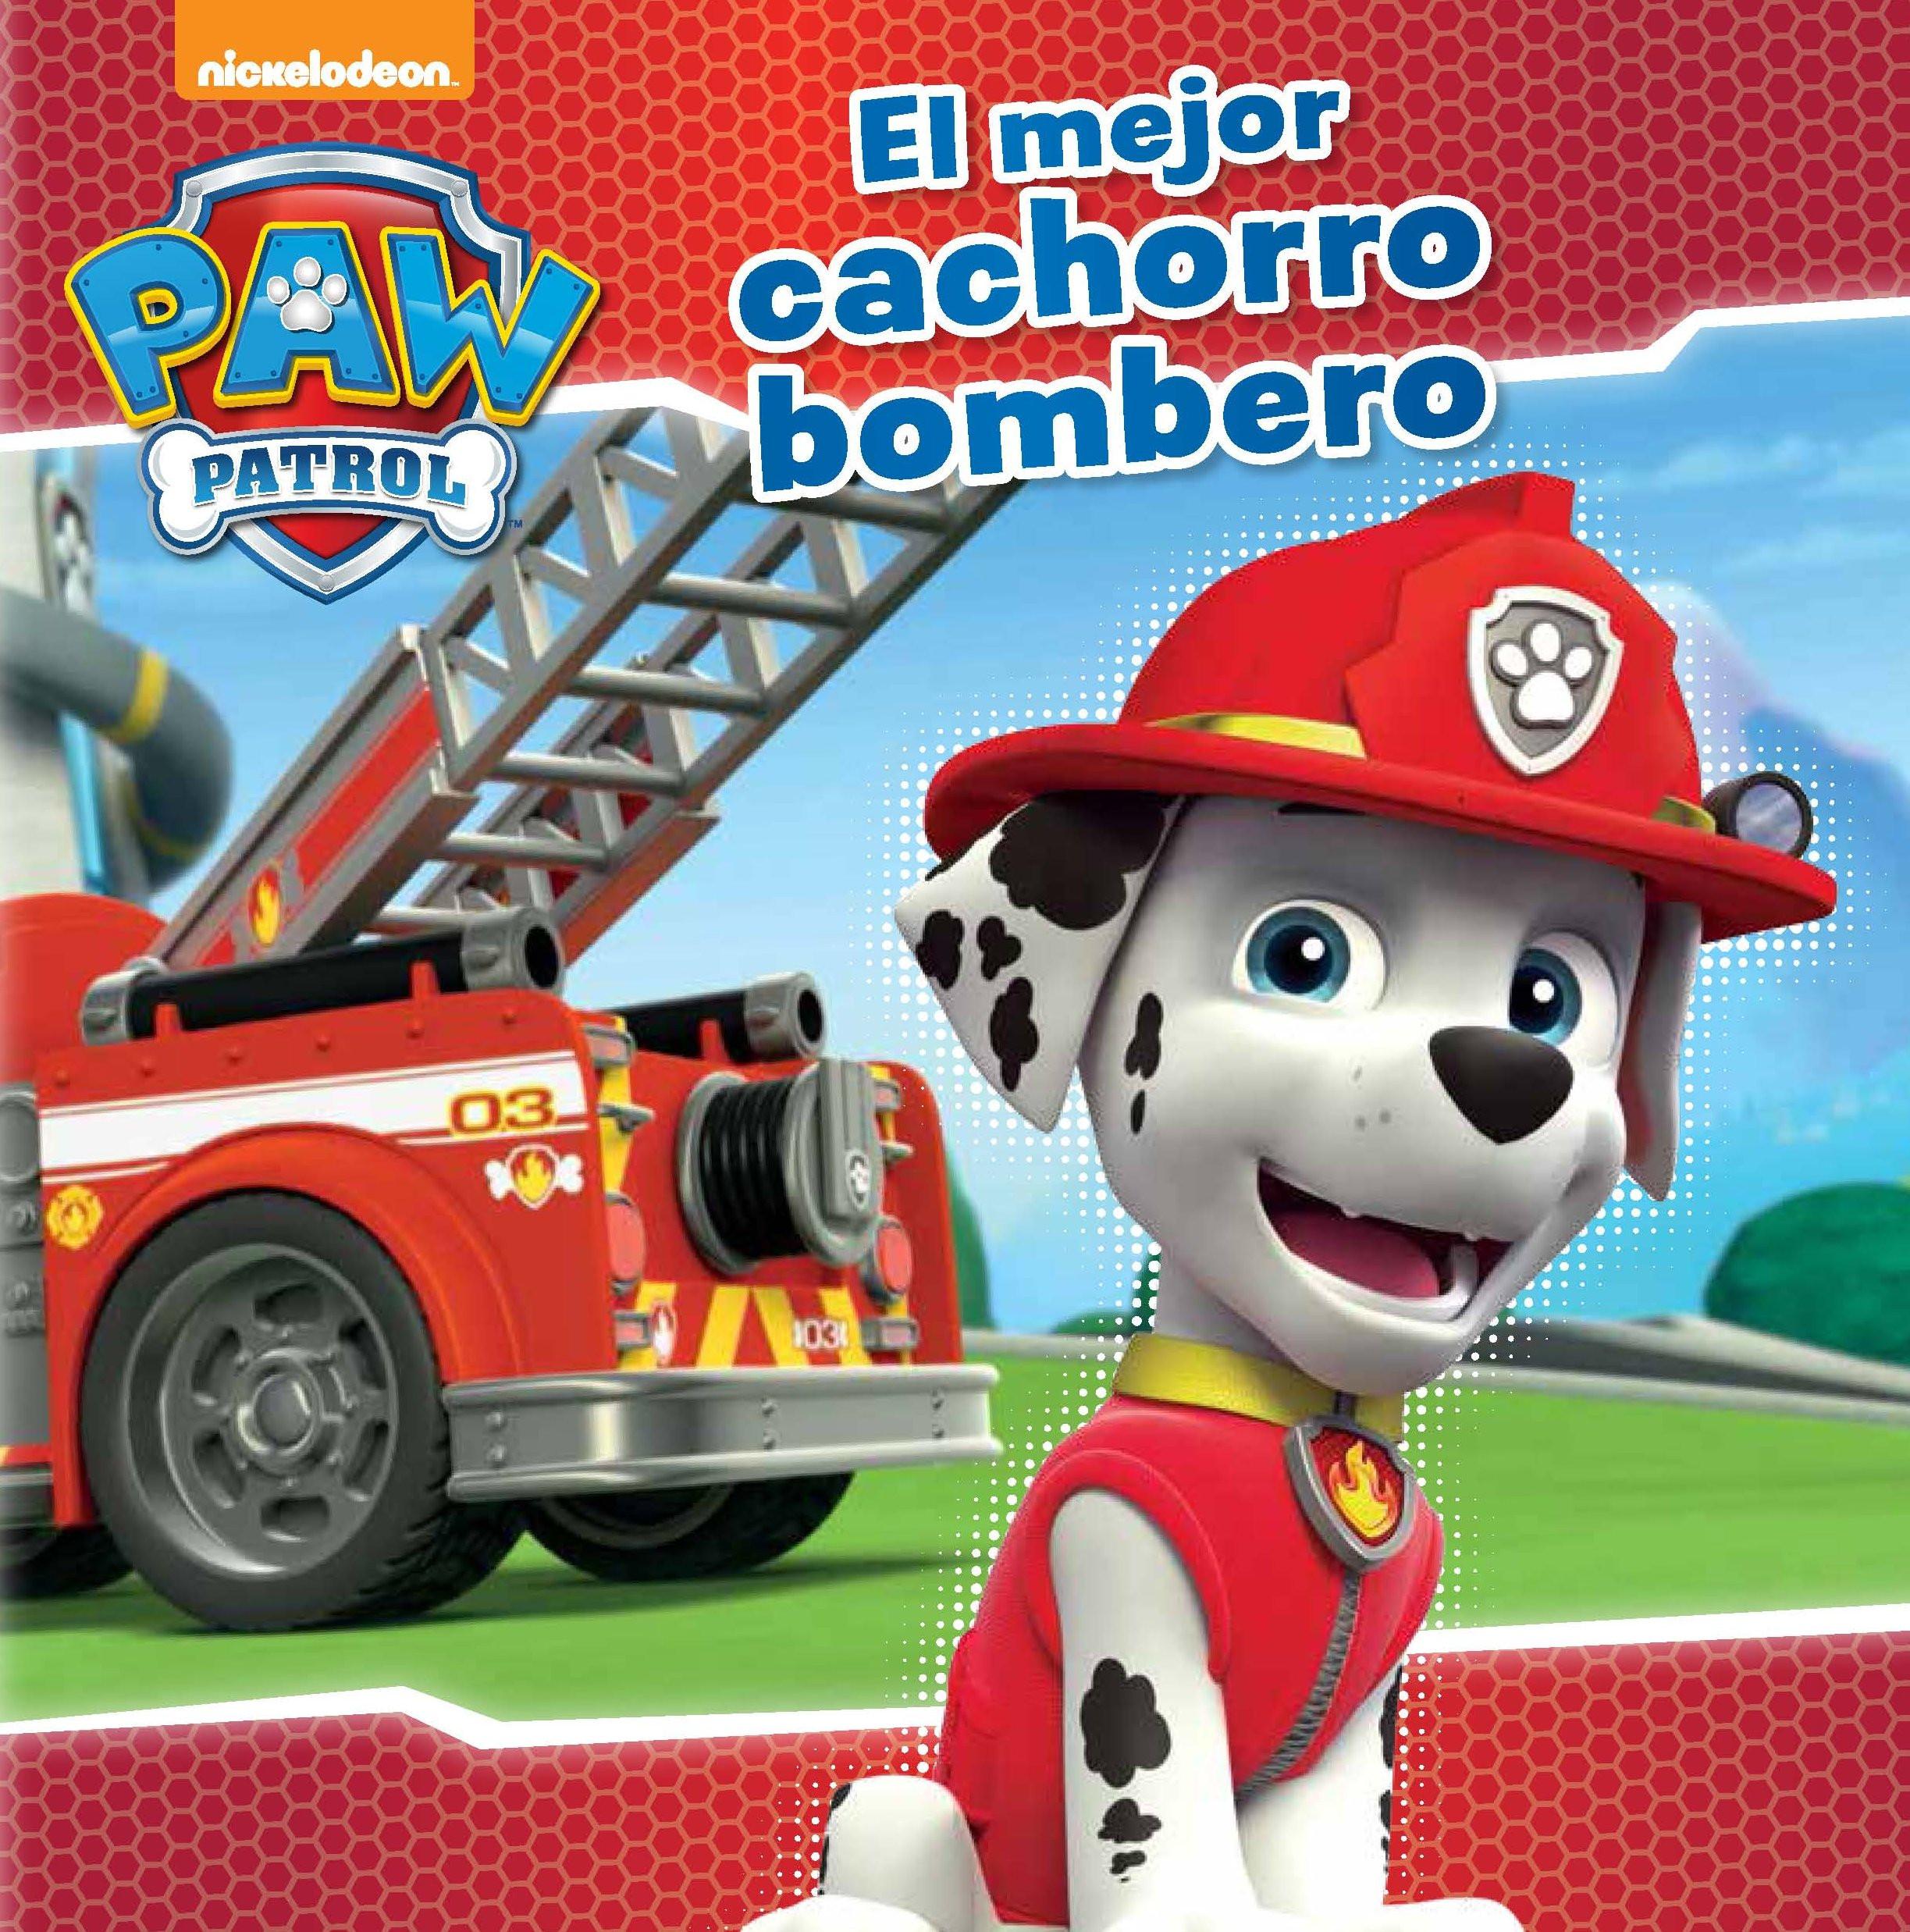 El mejor cachorro bombero (Paw Patrol | Patrulla Canina)